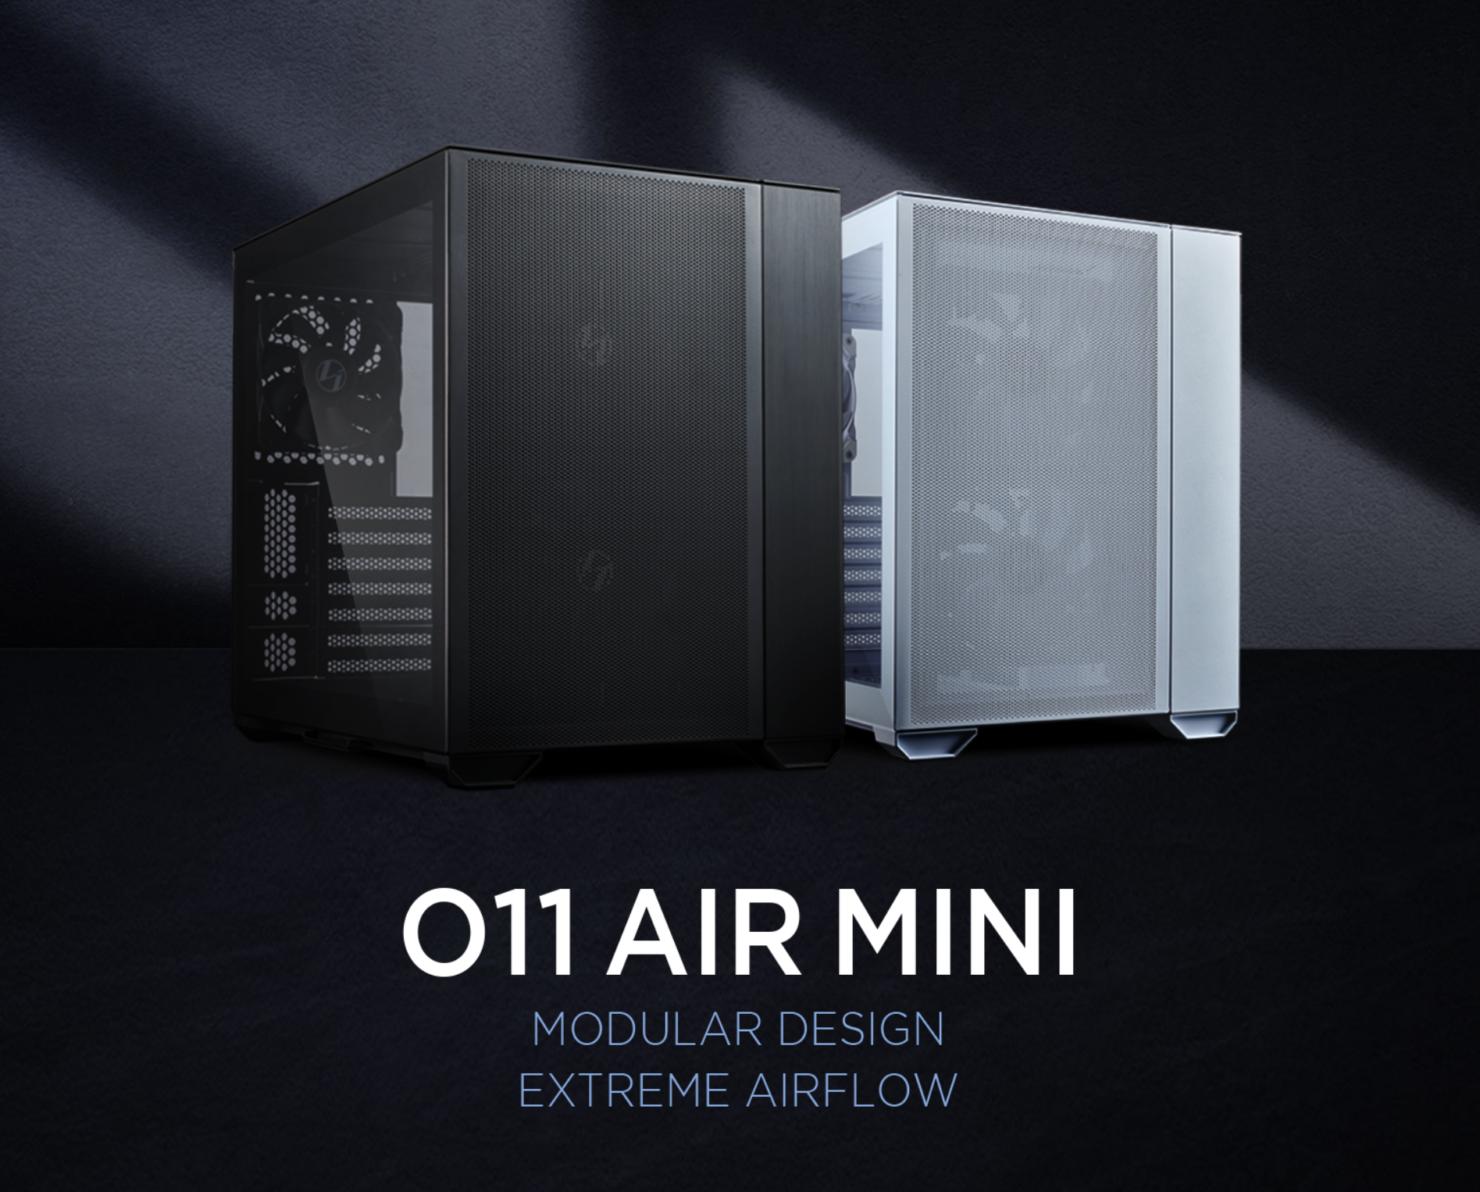 lian-li-launches-o11-air-mini,-a-small-footprint-modular-case-focusing-on-cooling-&-starting-at-$109-us